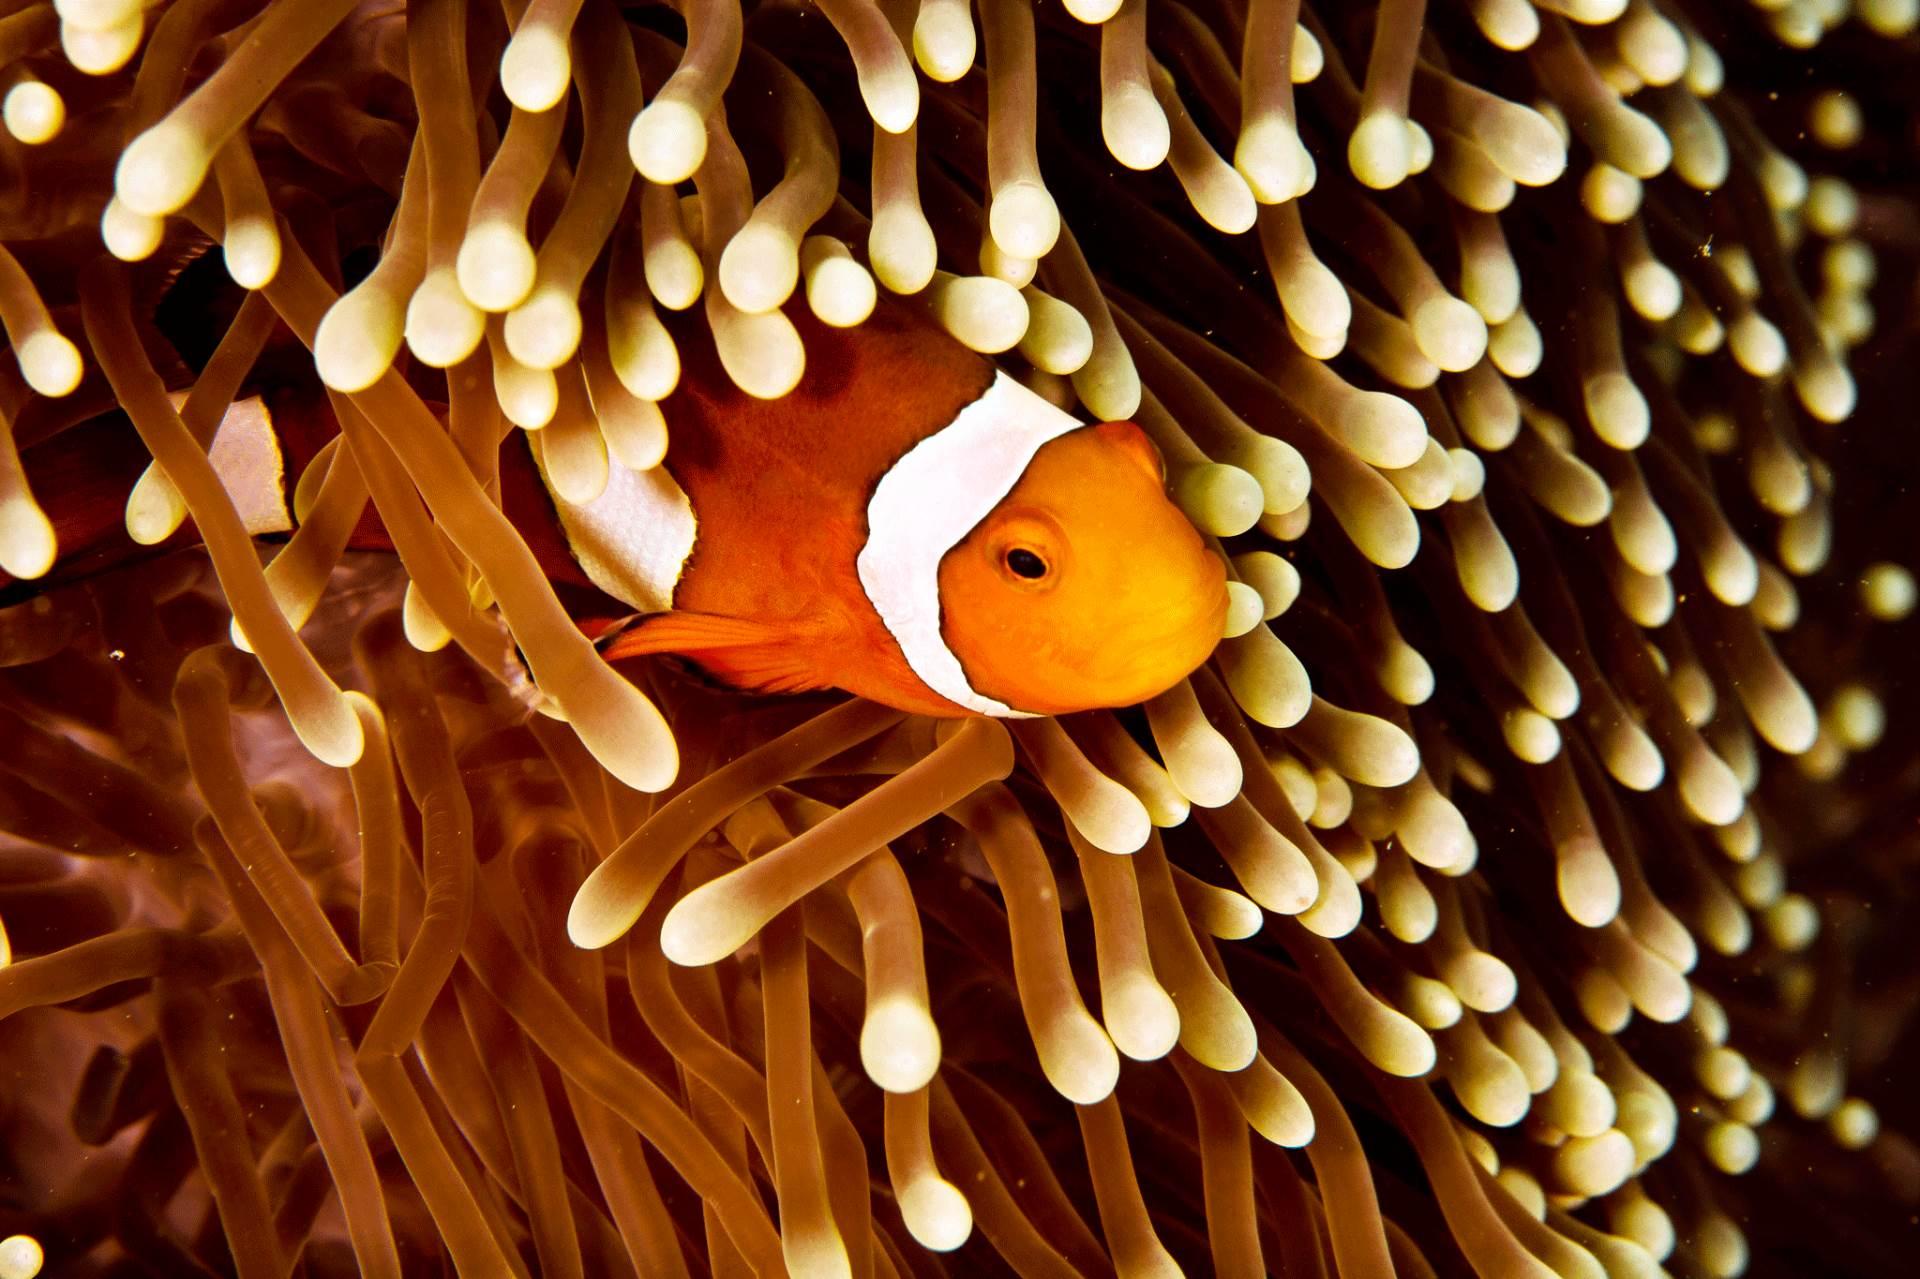 Anemone Clown Fish (Premnas biaculeatus, female)